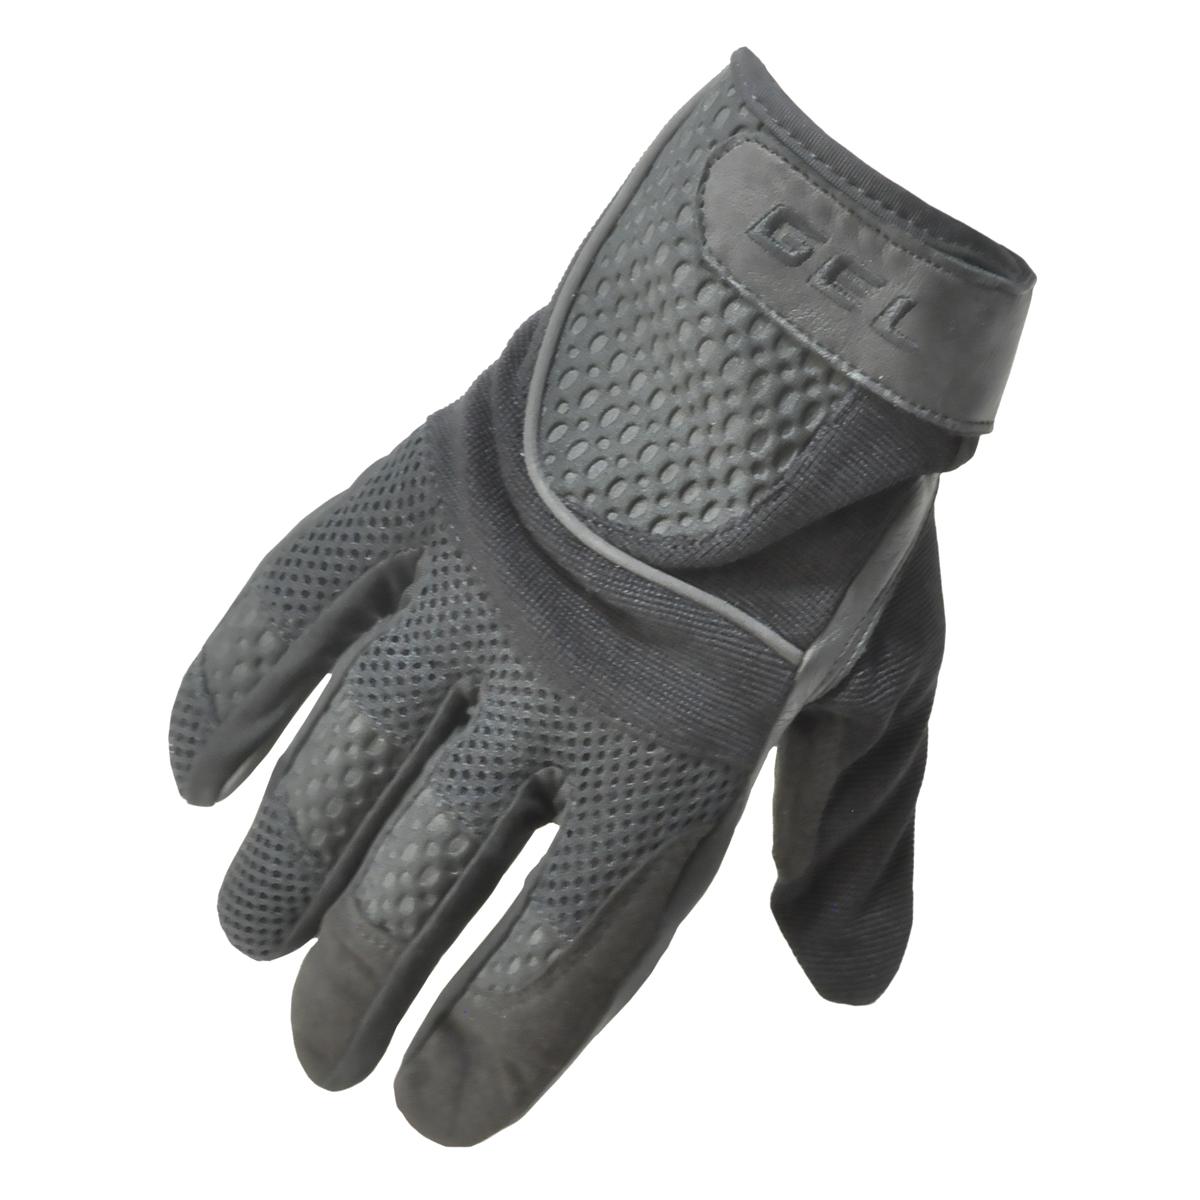 Men's Fulmer G9 Gel Gloves Motorcycle Riding Gloves Black Large with Gel Palm